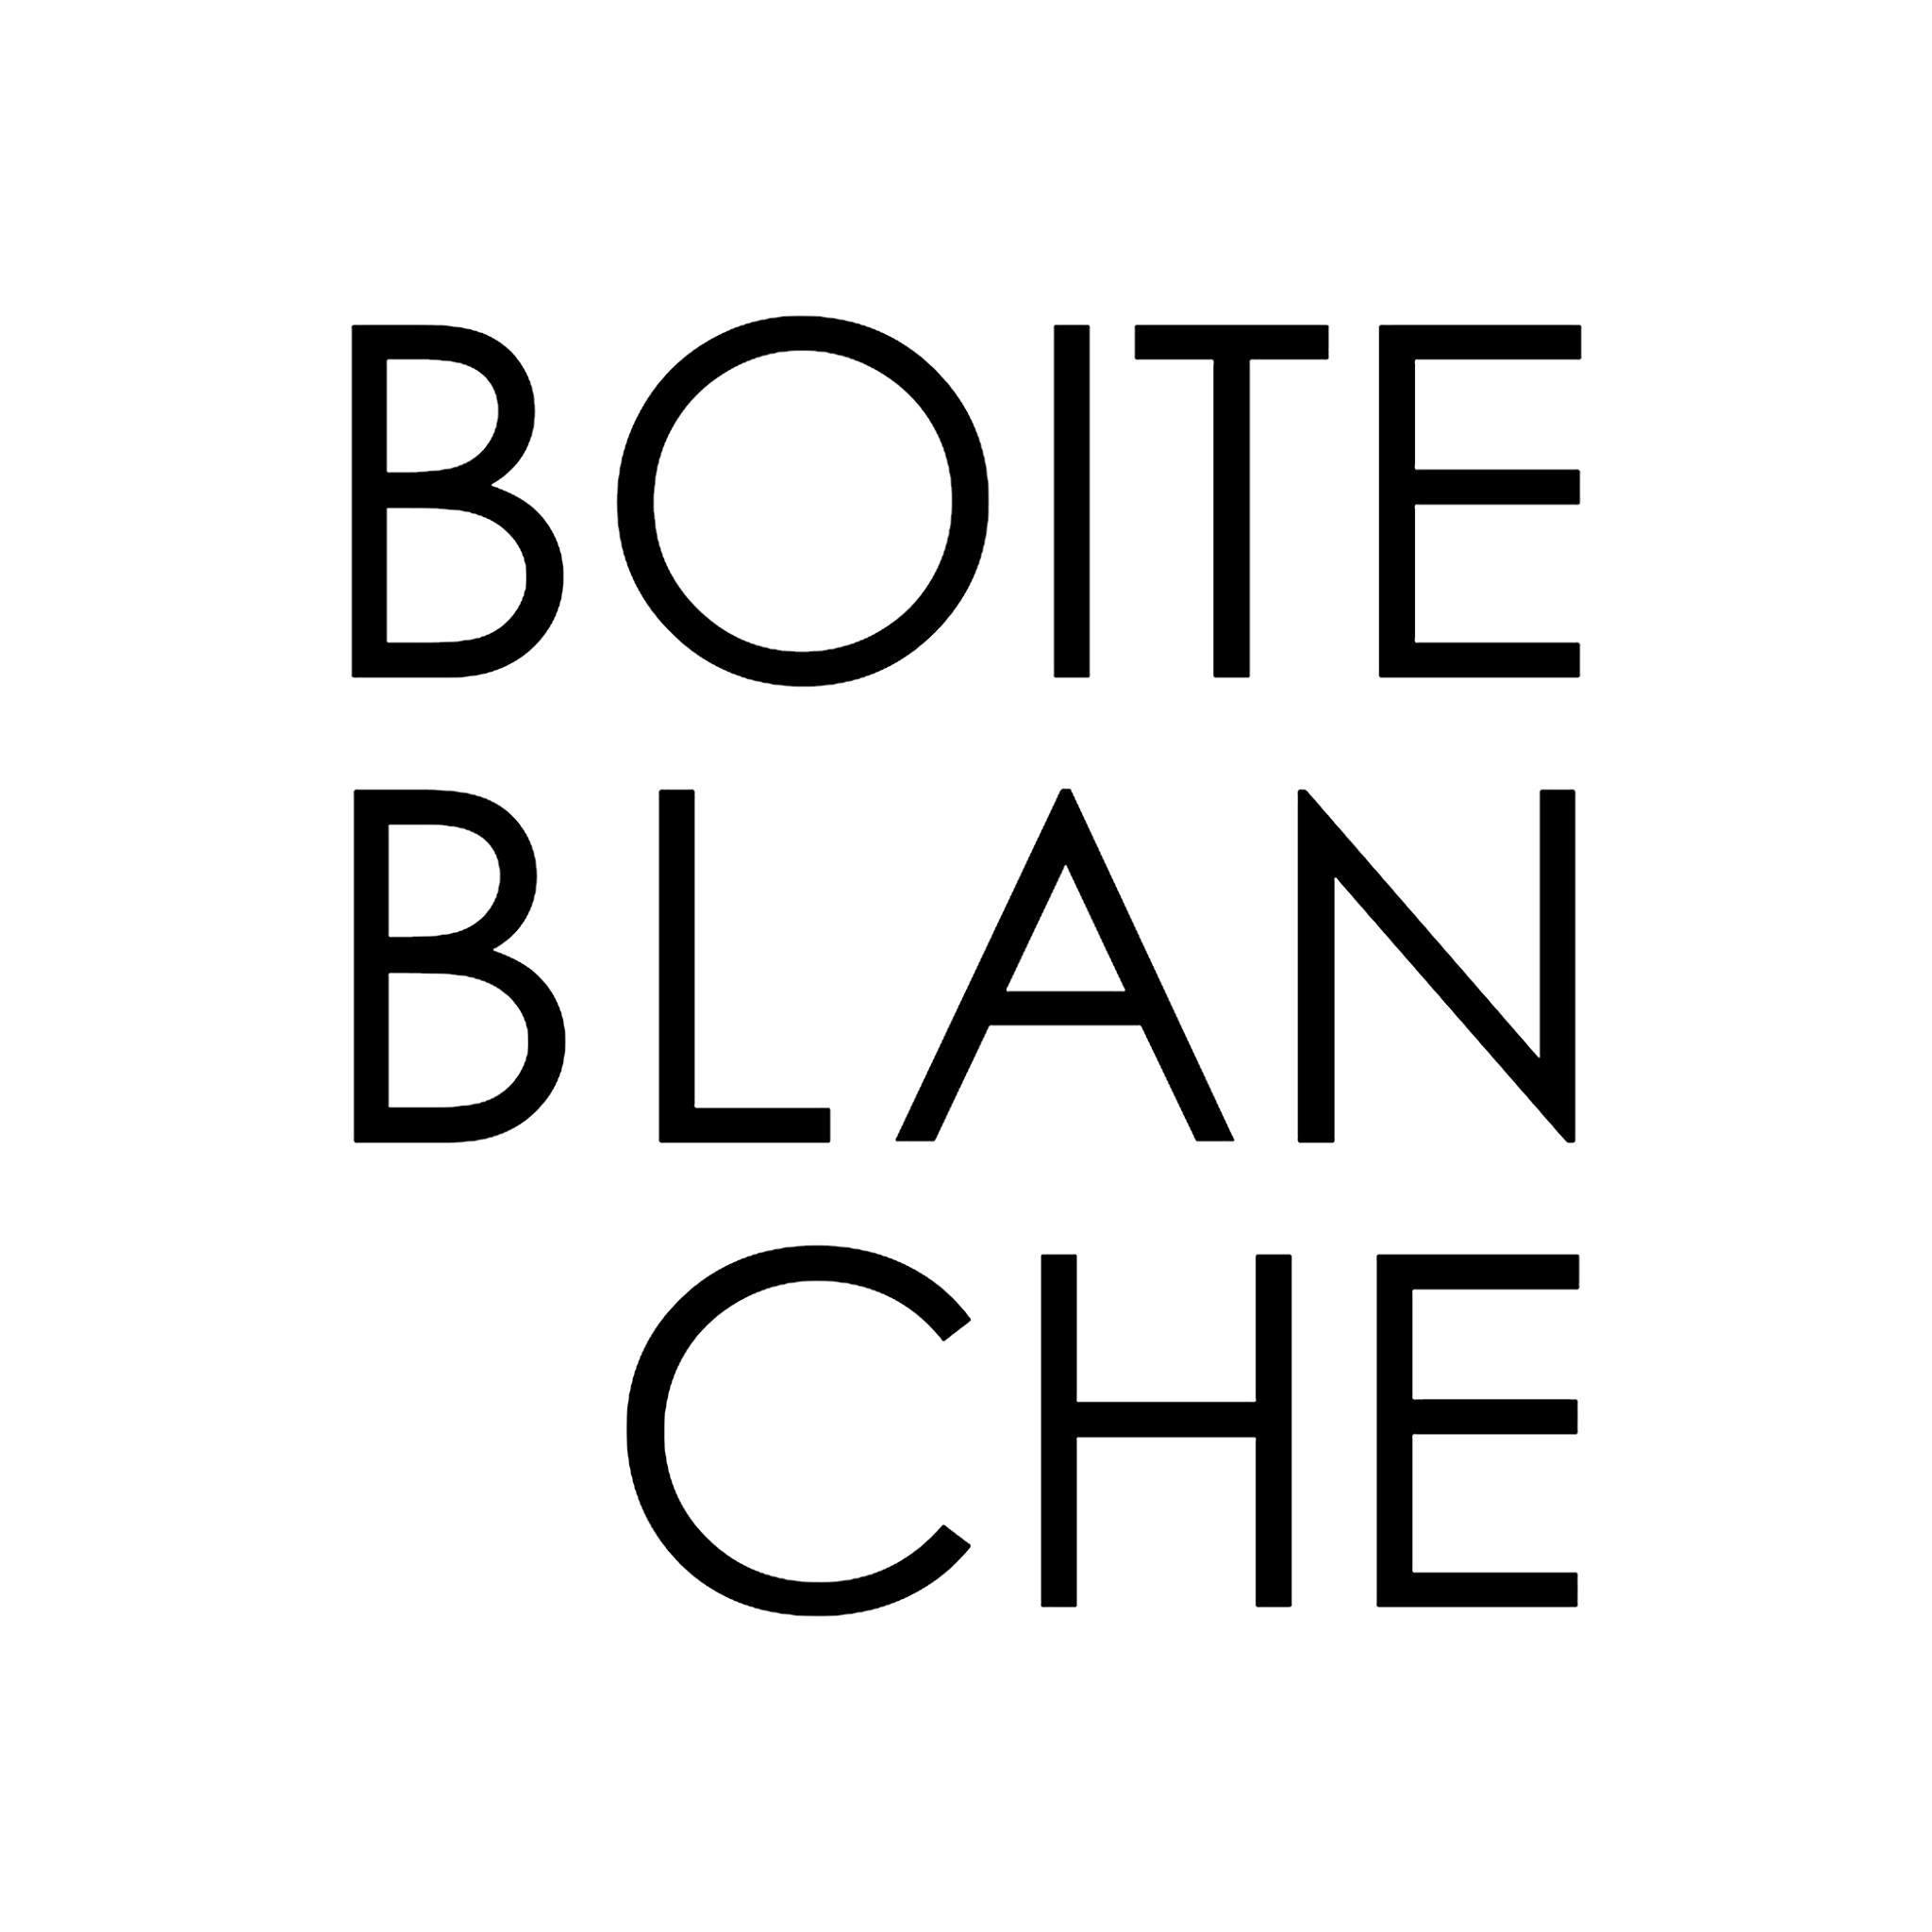 Boite Blanche logo